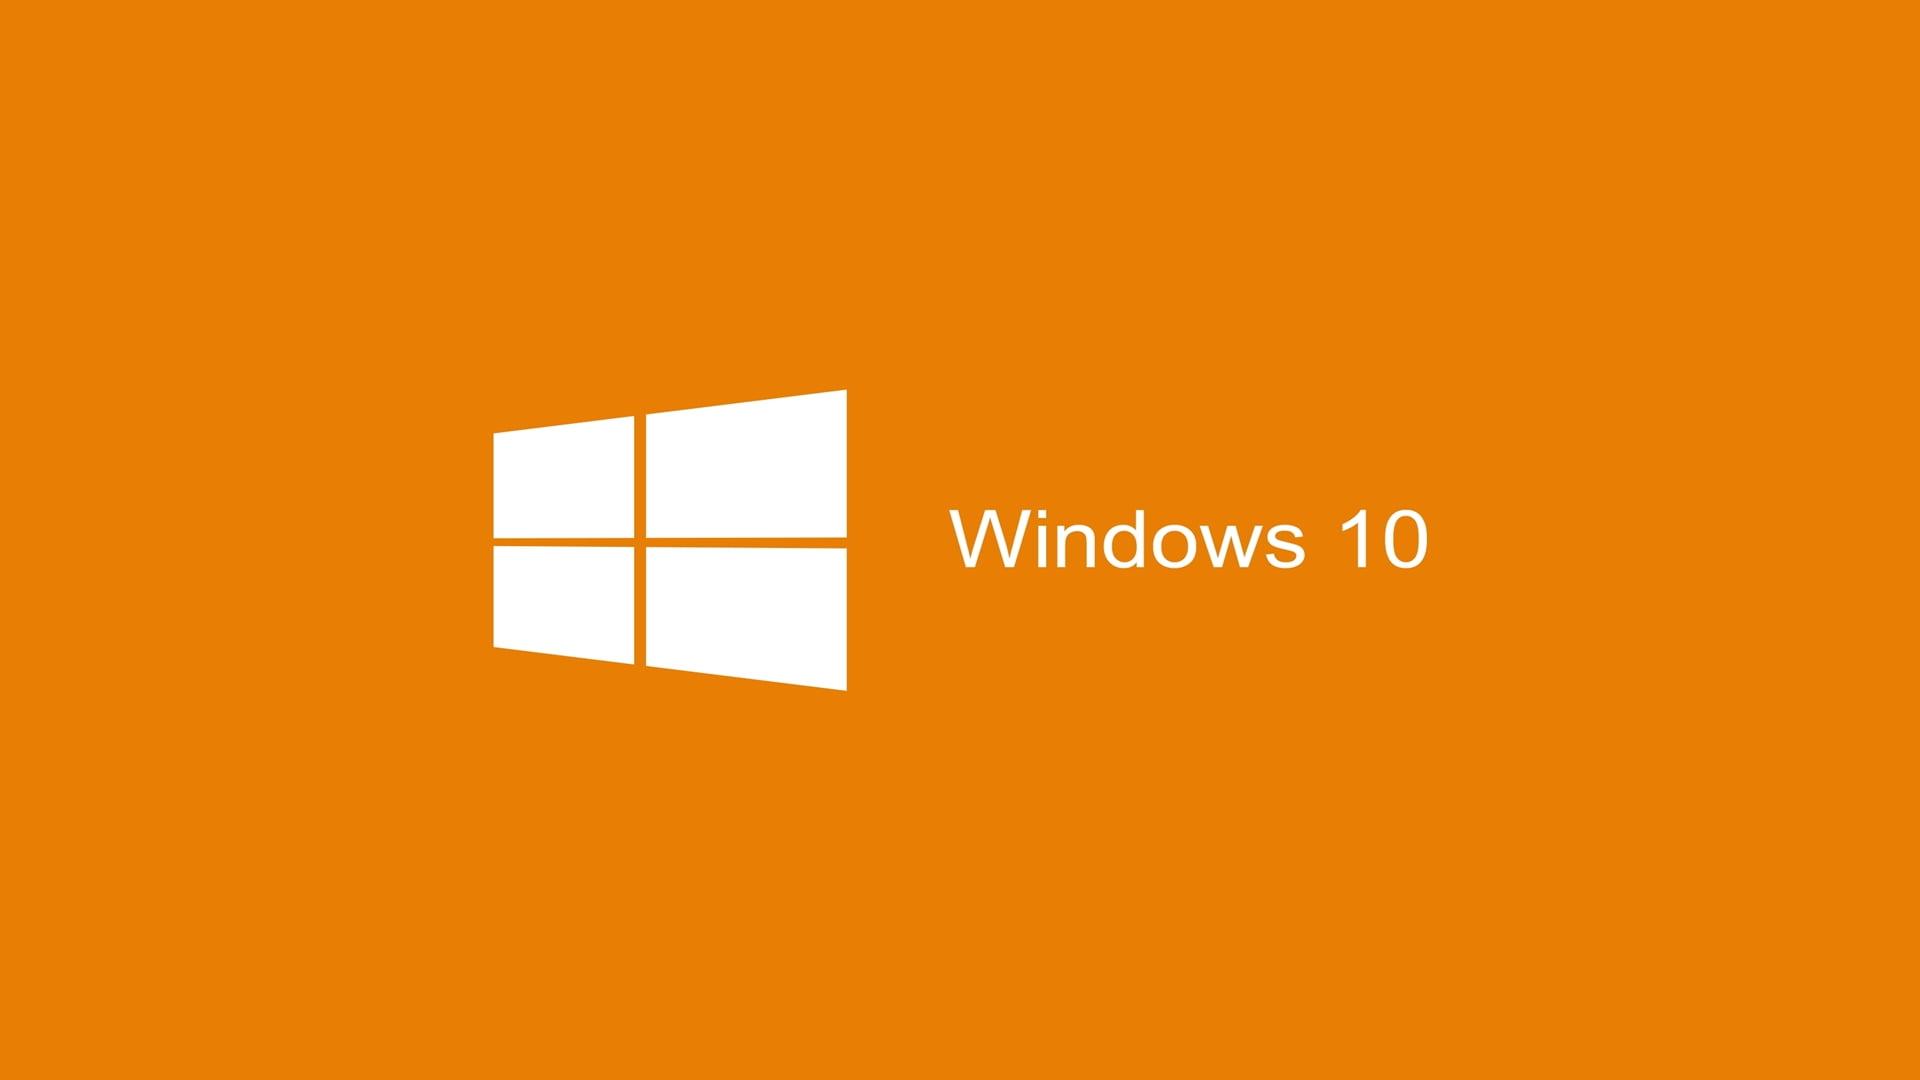 Papéis de parede do Windows 10 7